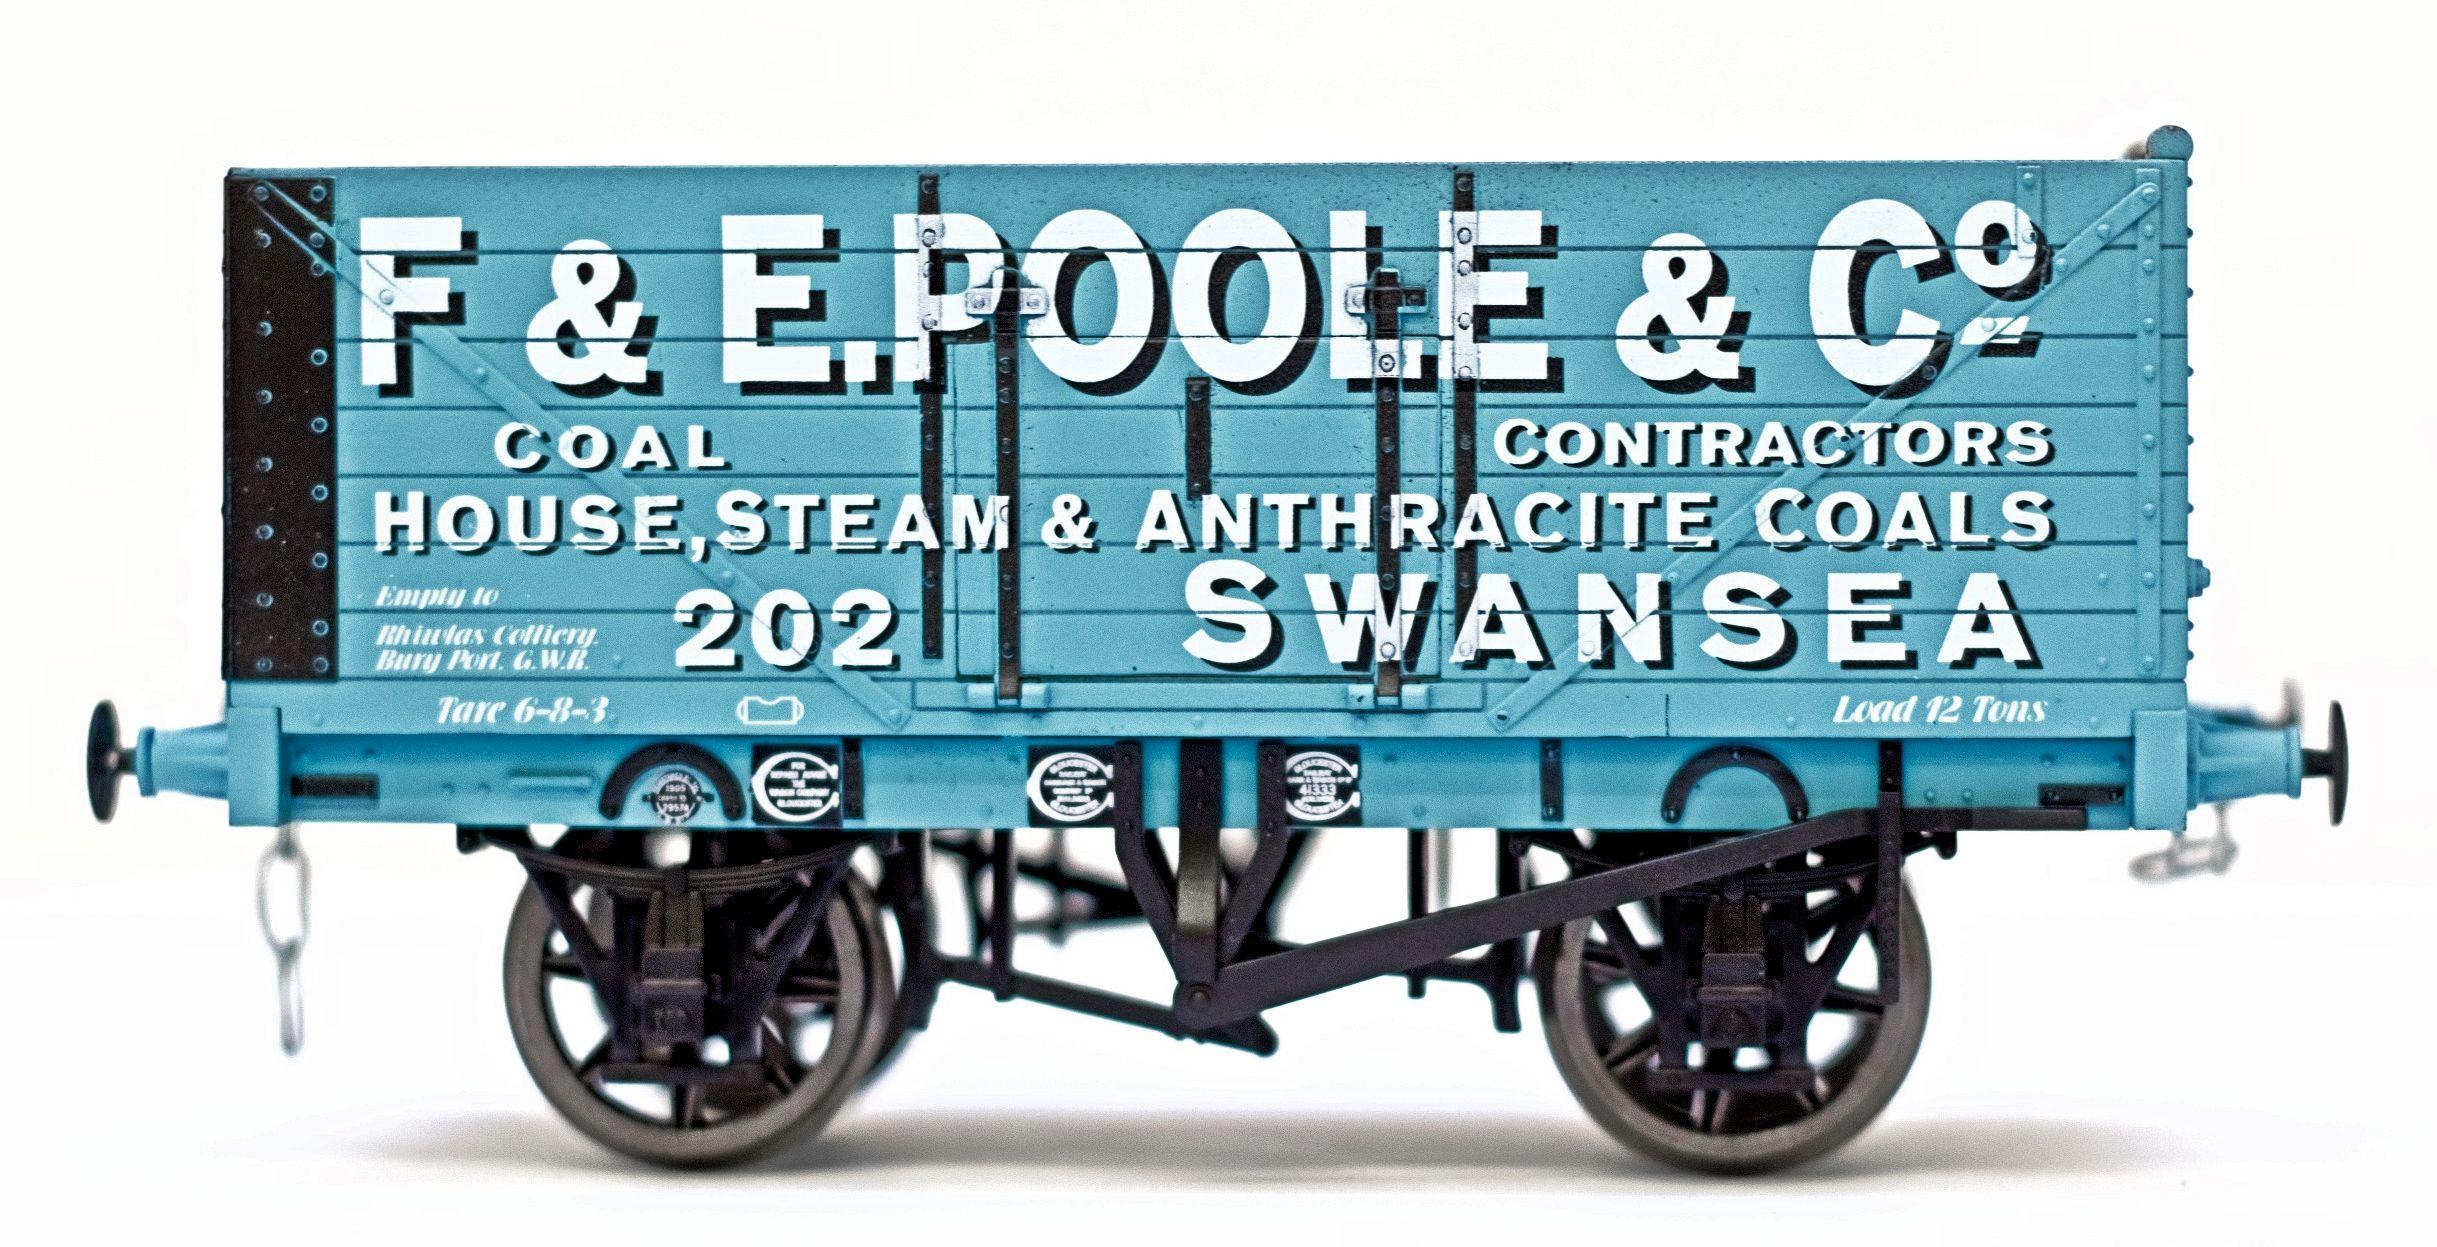 F&EPOOLE&CO 3 (1) (2).jpg